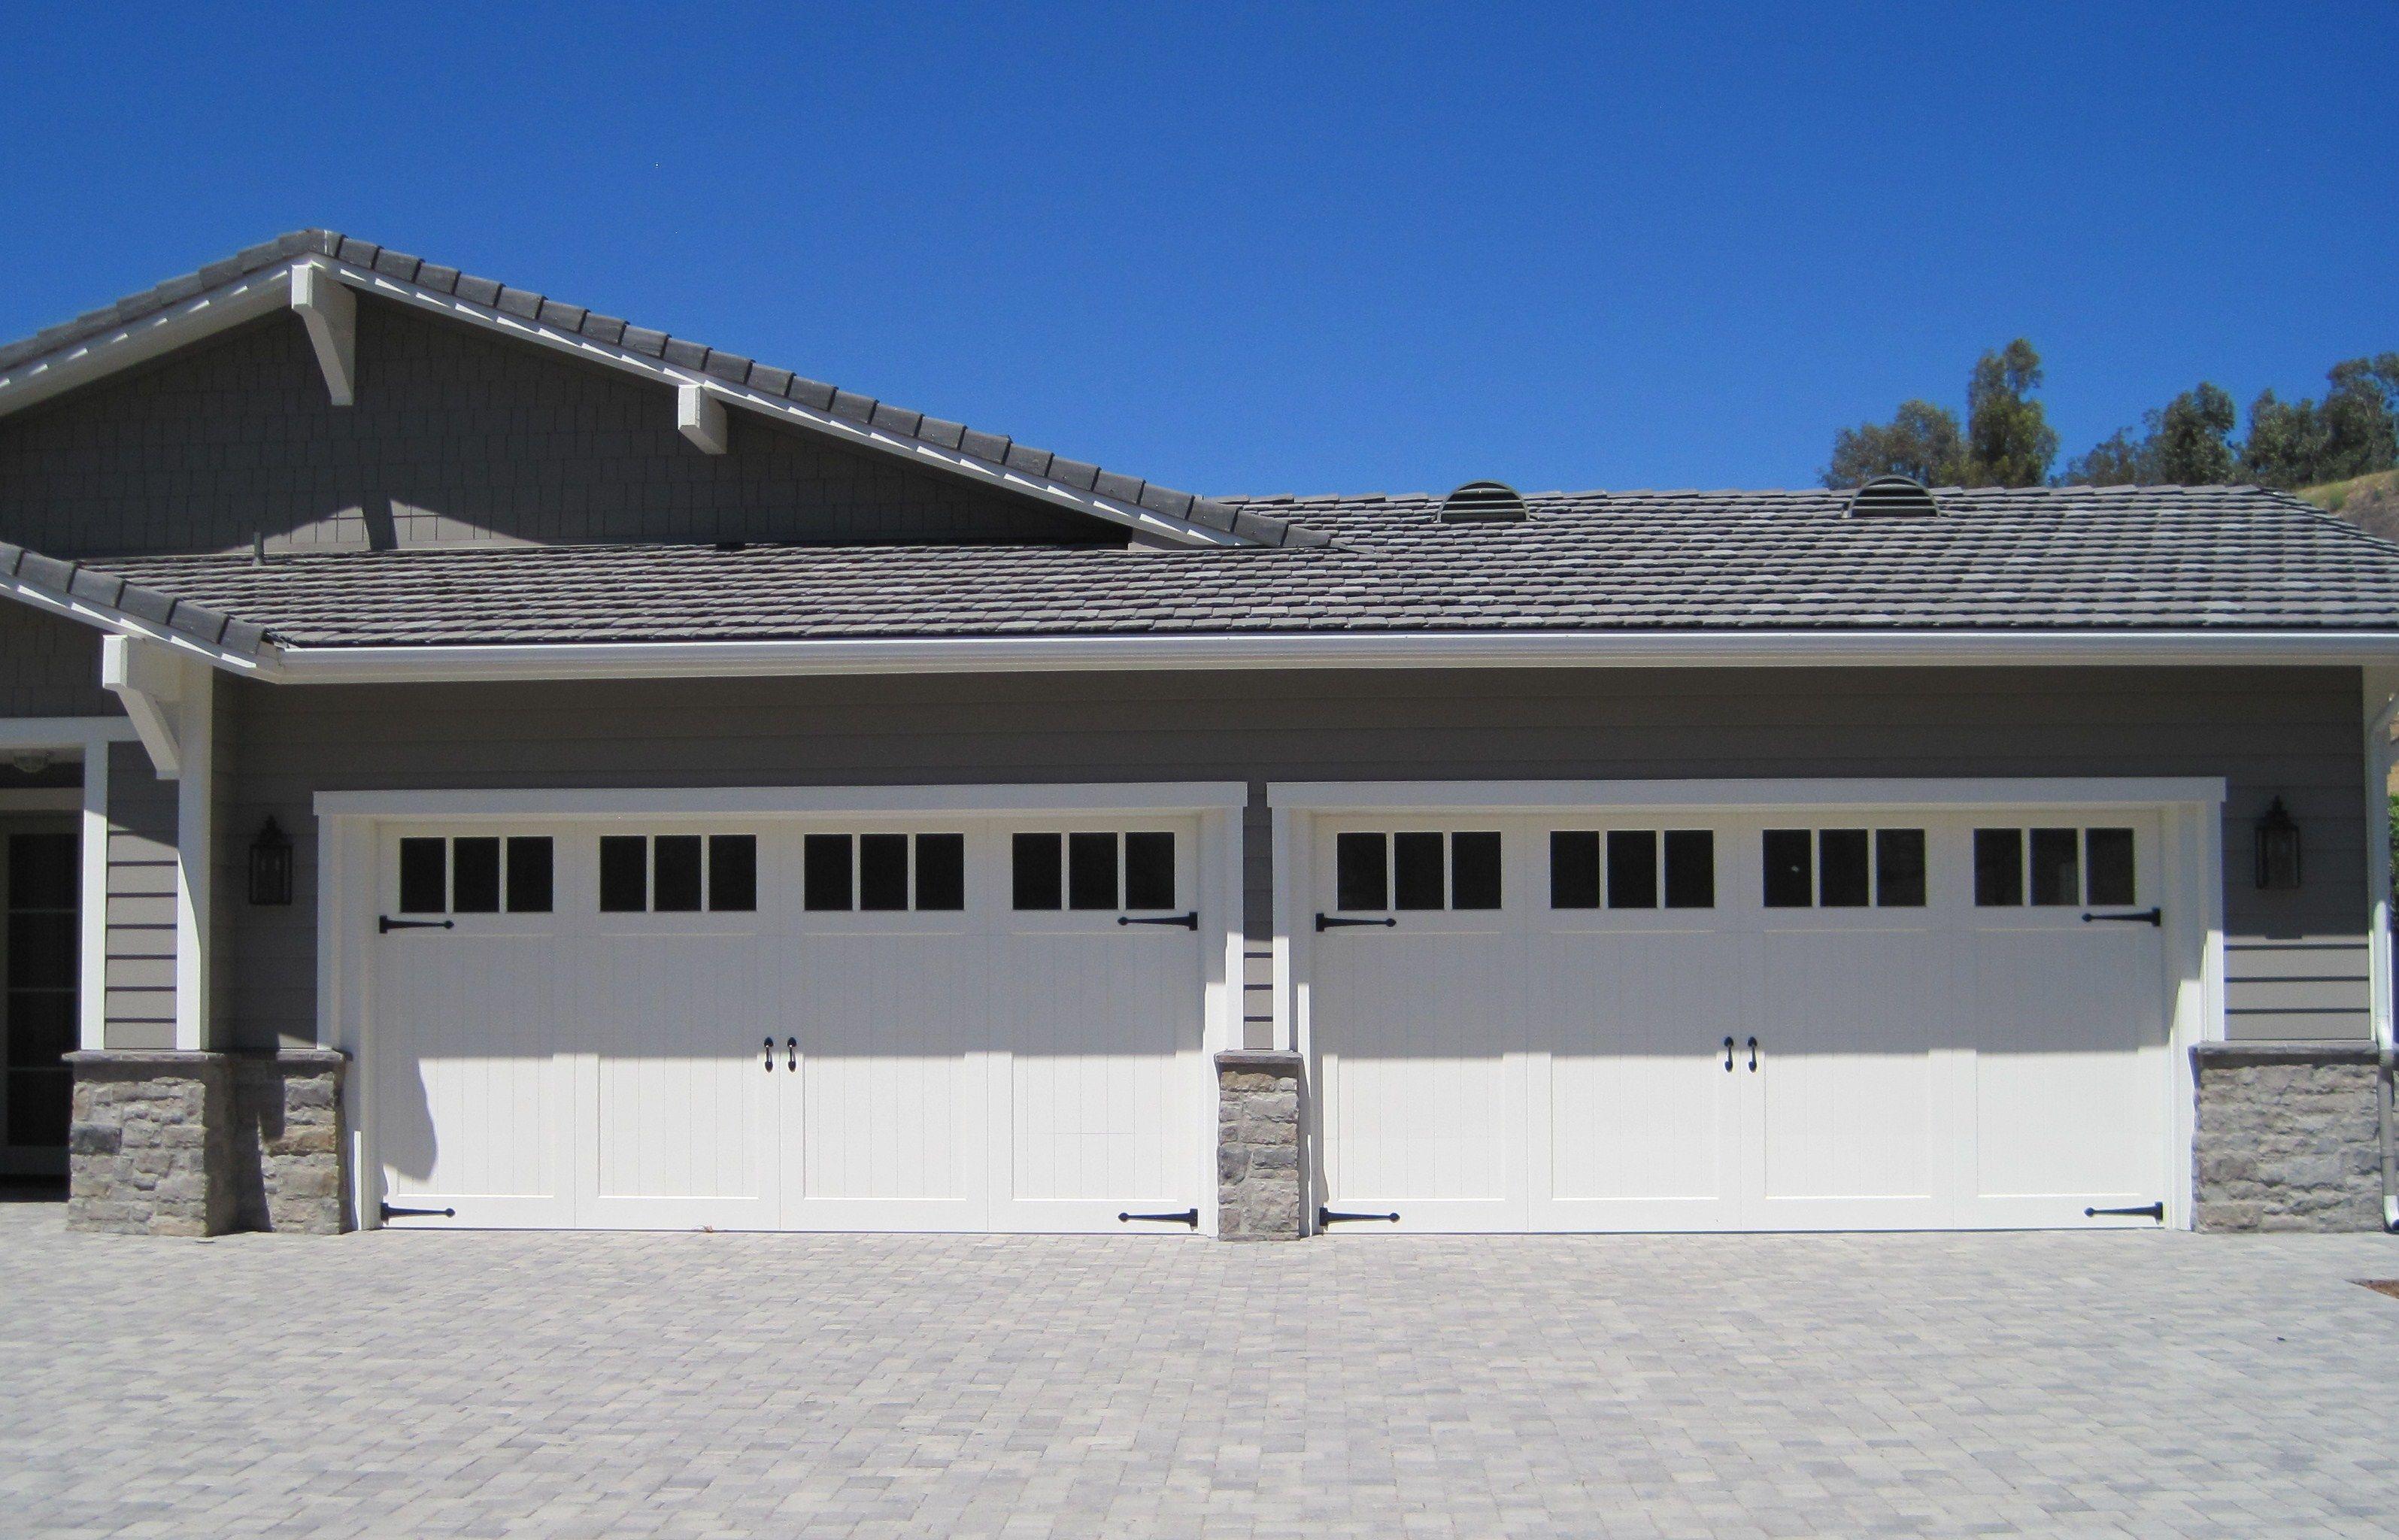 Craftsman Style Paint Grade Garage Door Los Angeles Ca Photo Credit Agi Dyer Craftsman Garage Door Spring Repair Garage Doors For Sale Garage Door Springs